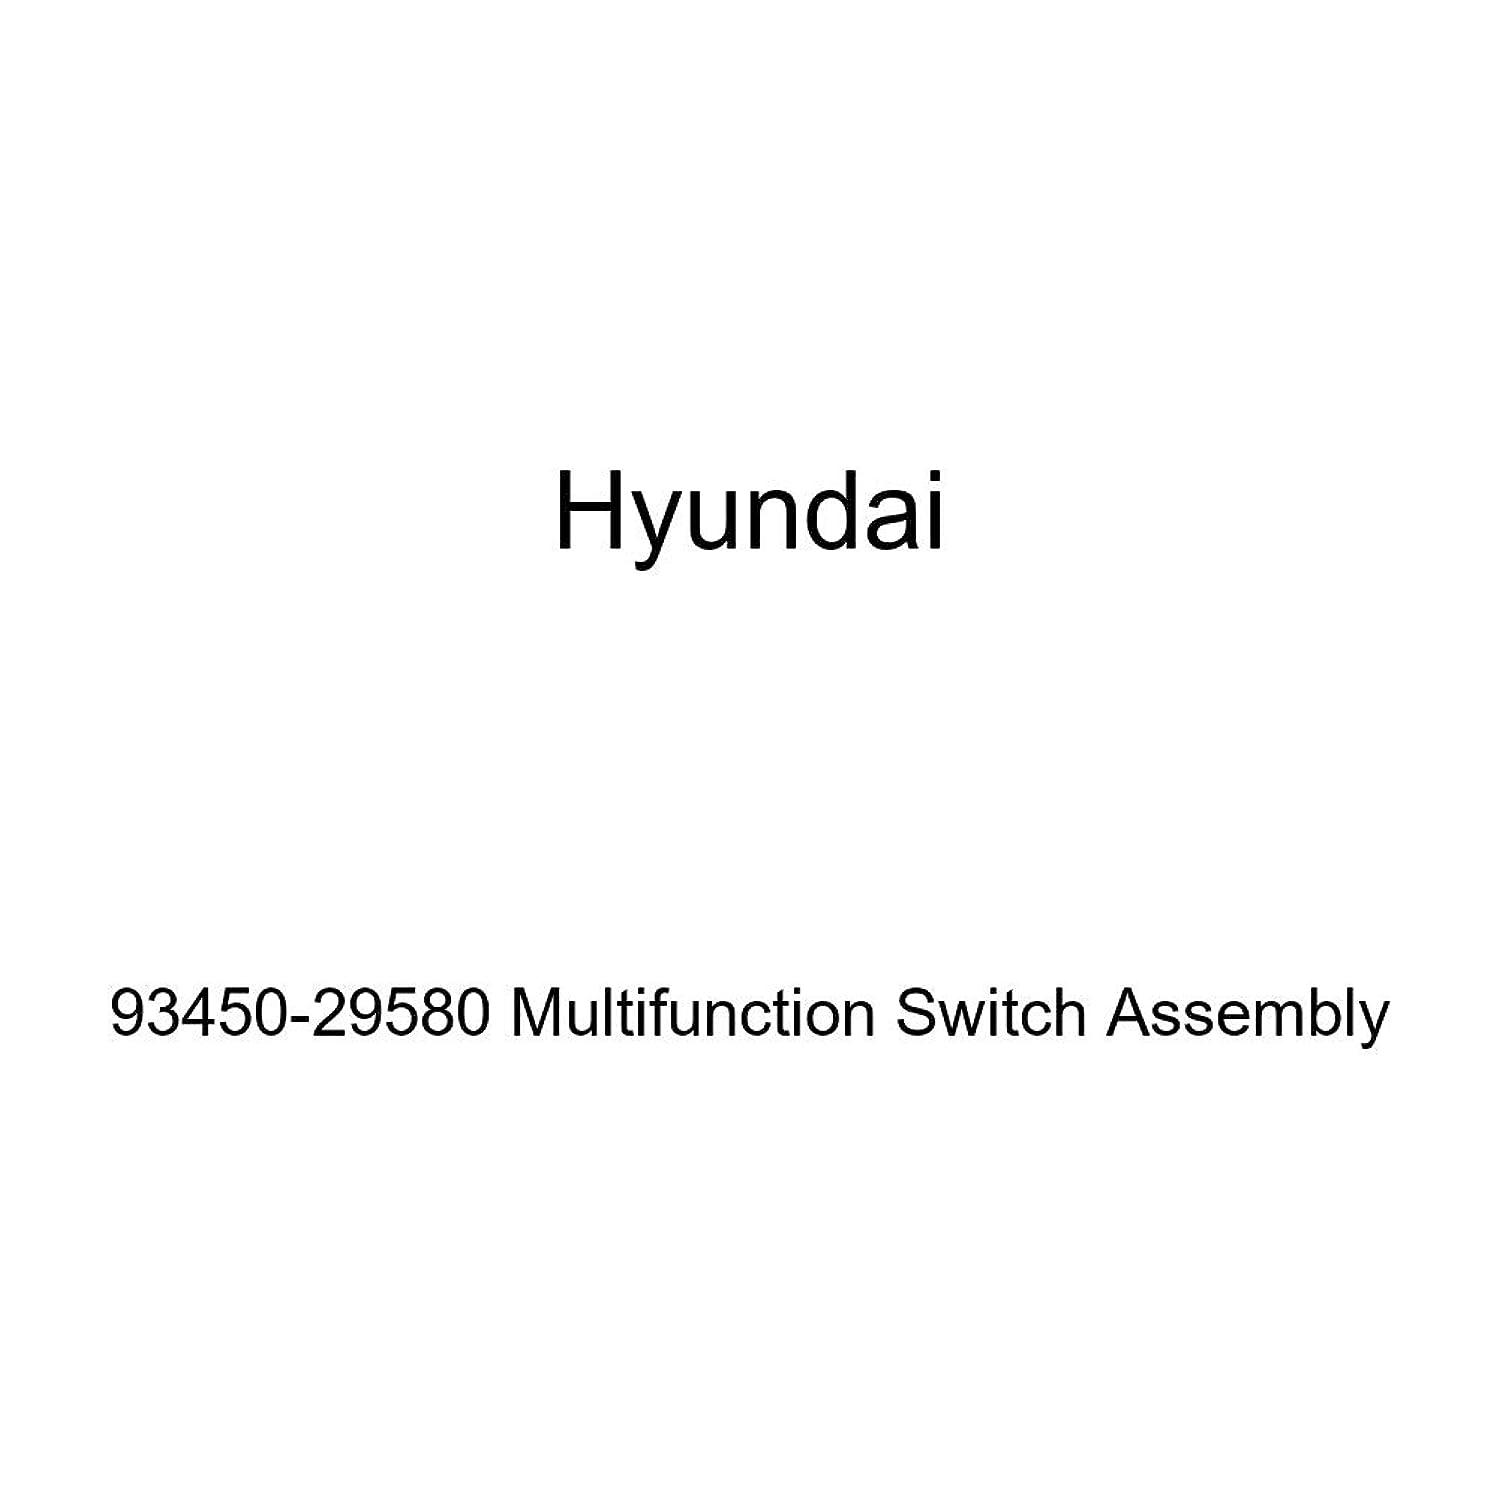 Genuine Hyundai 93450-29580 Multifunction Switch Assembly